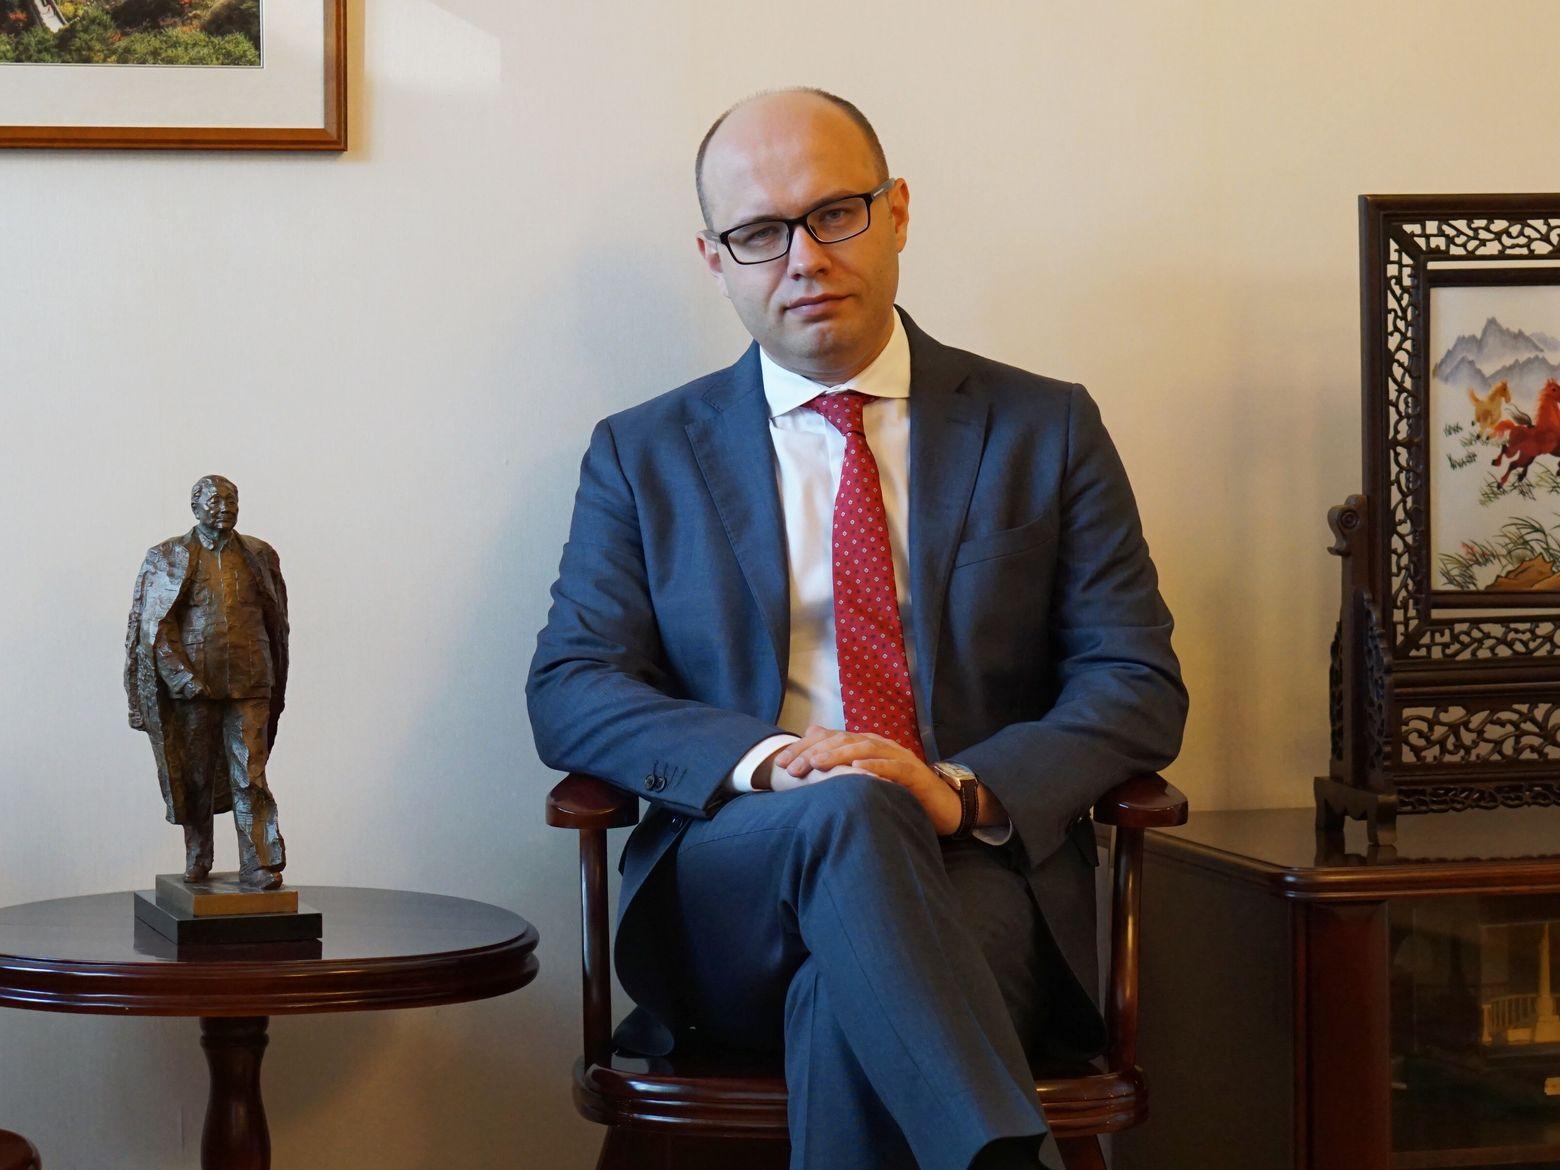 Посол Беларуси в Китае Кирилл Рудый